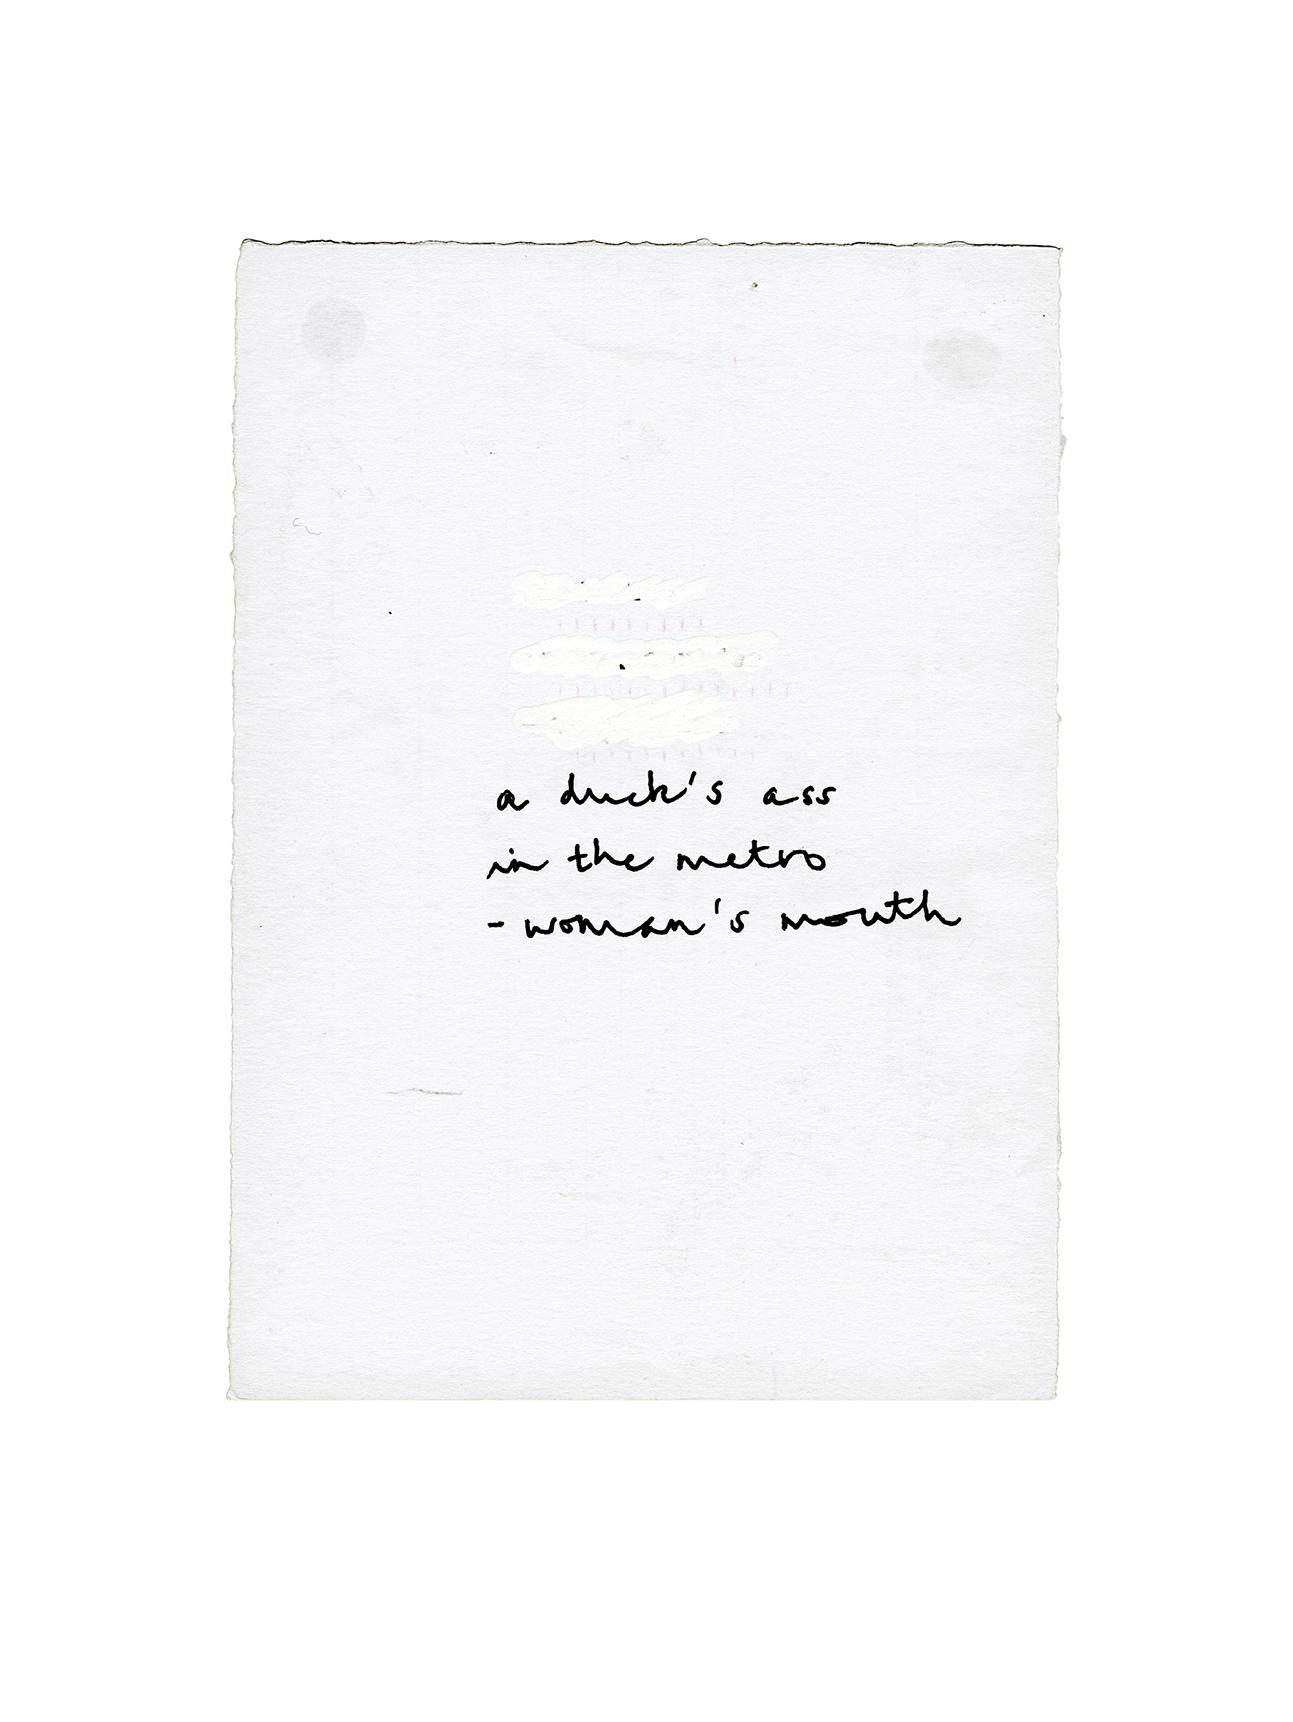 Poems22 copy.jpg